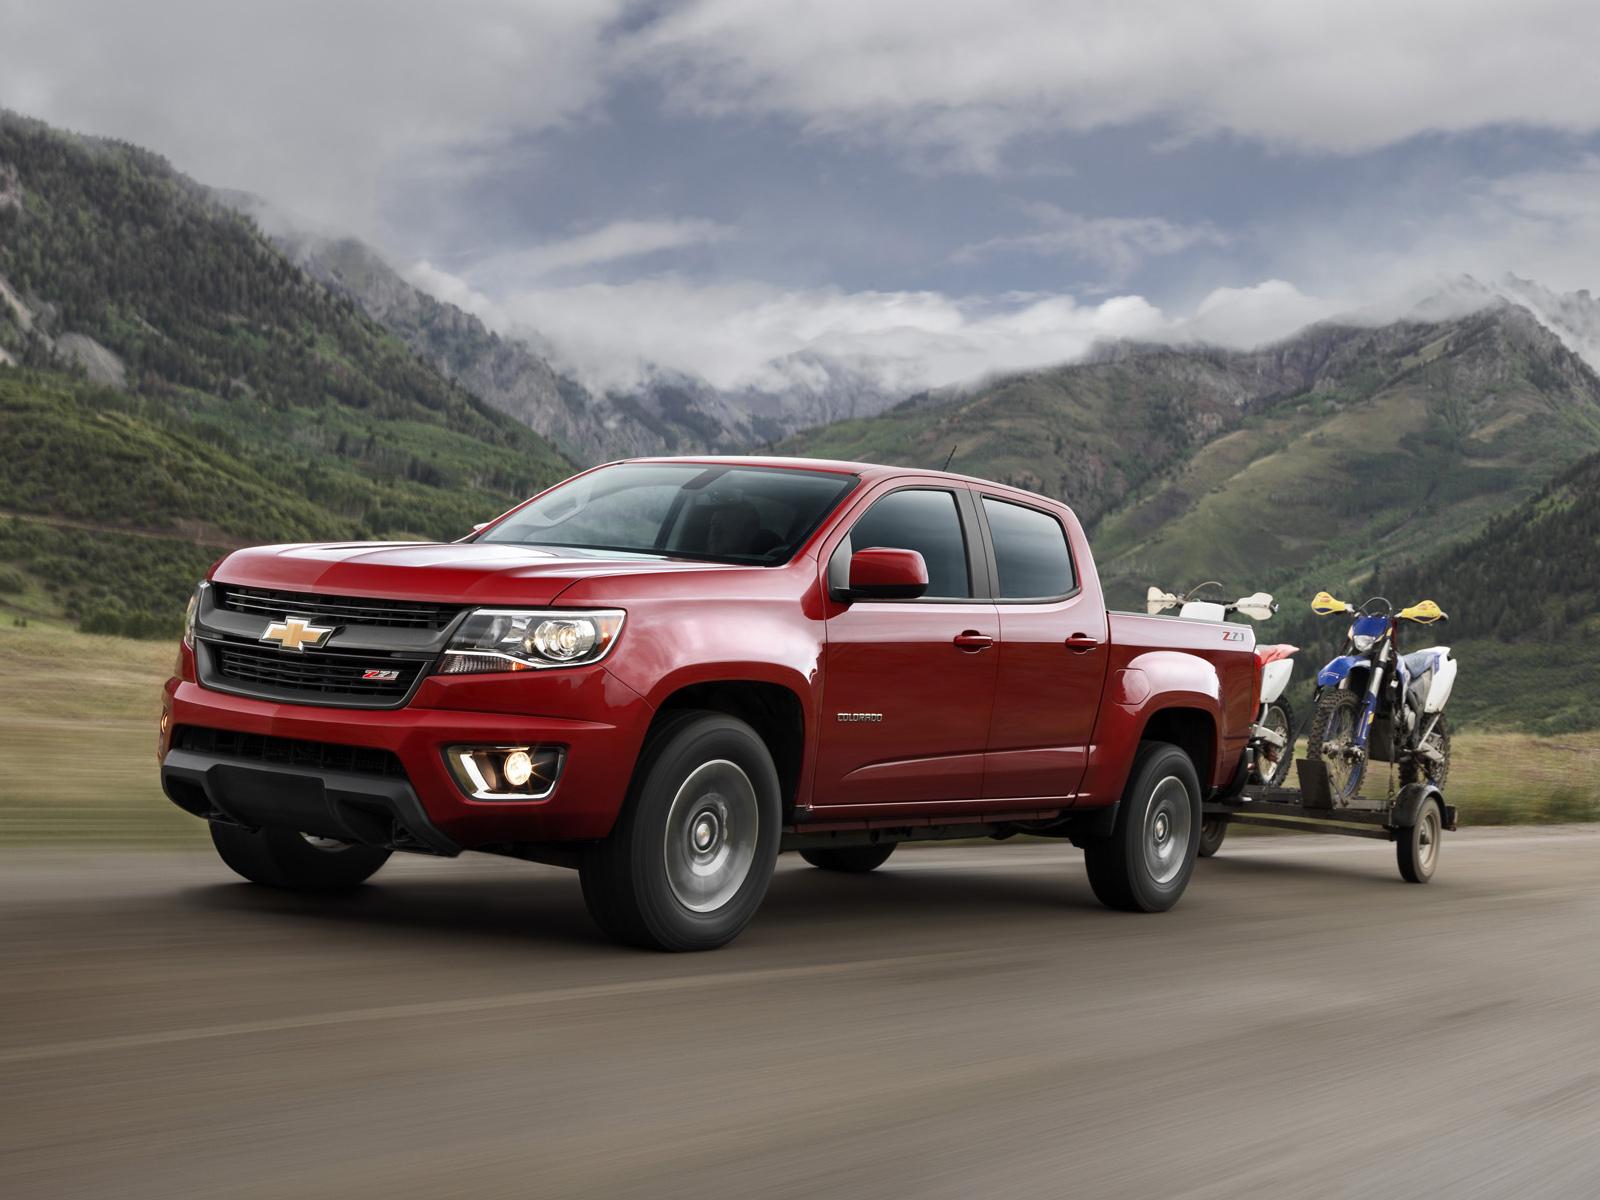 2014 Chevy Colorado Pick Up